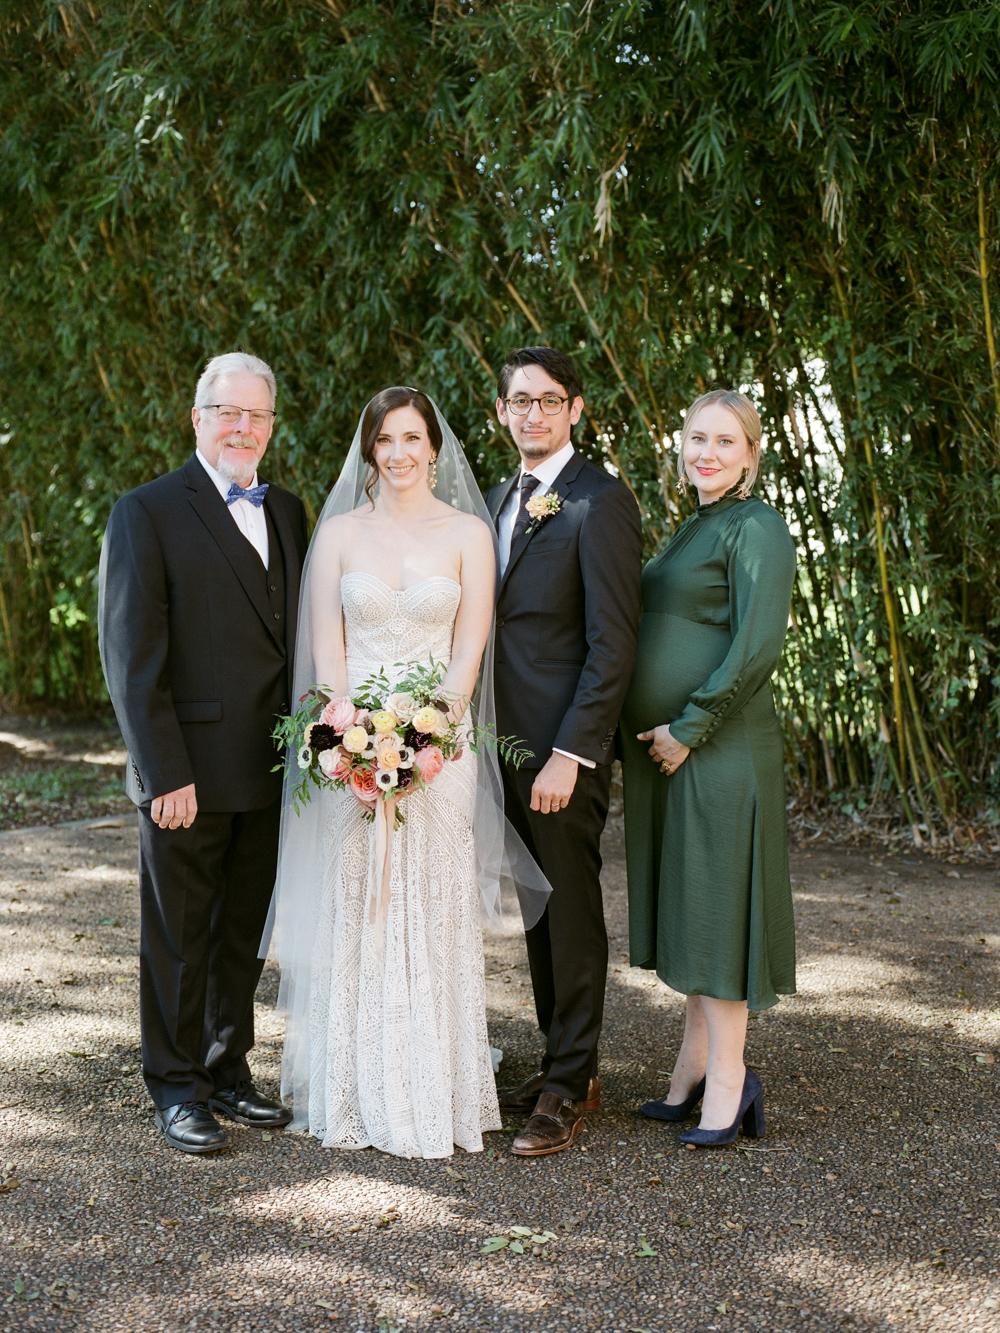 fall wedding at rothko chapel- houston wedding photographer-christine gosch - film photographer - elopement photographer- intimate wedding - lovely bride wedding gown-25.jpg